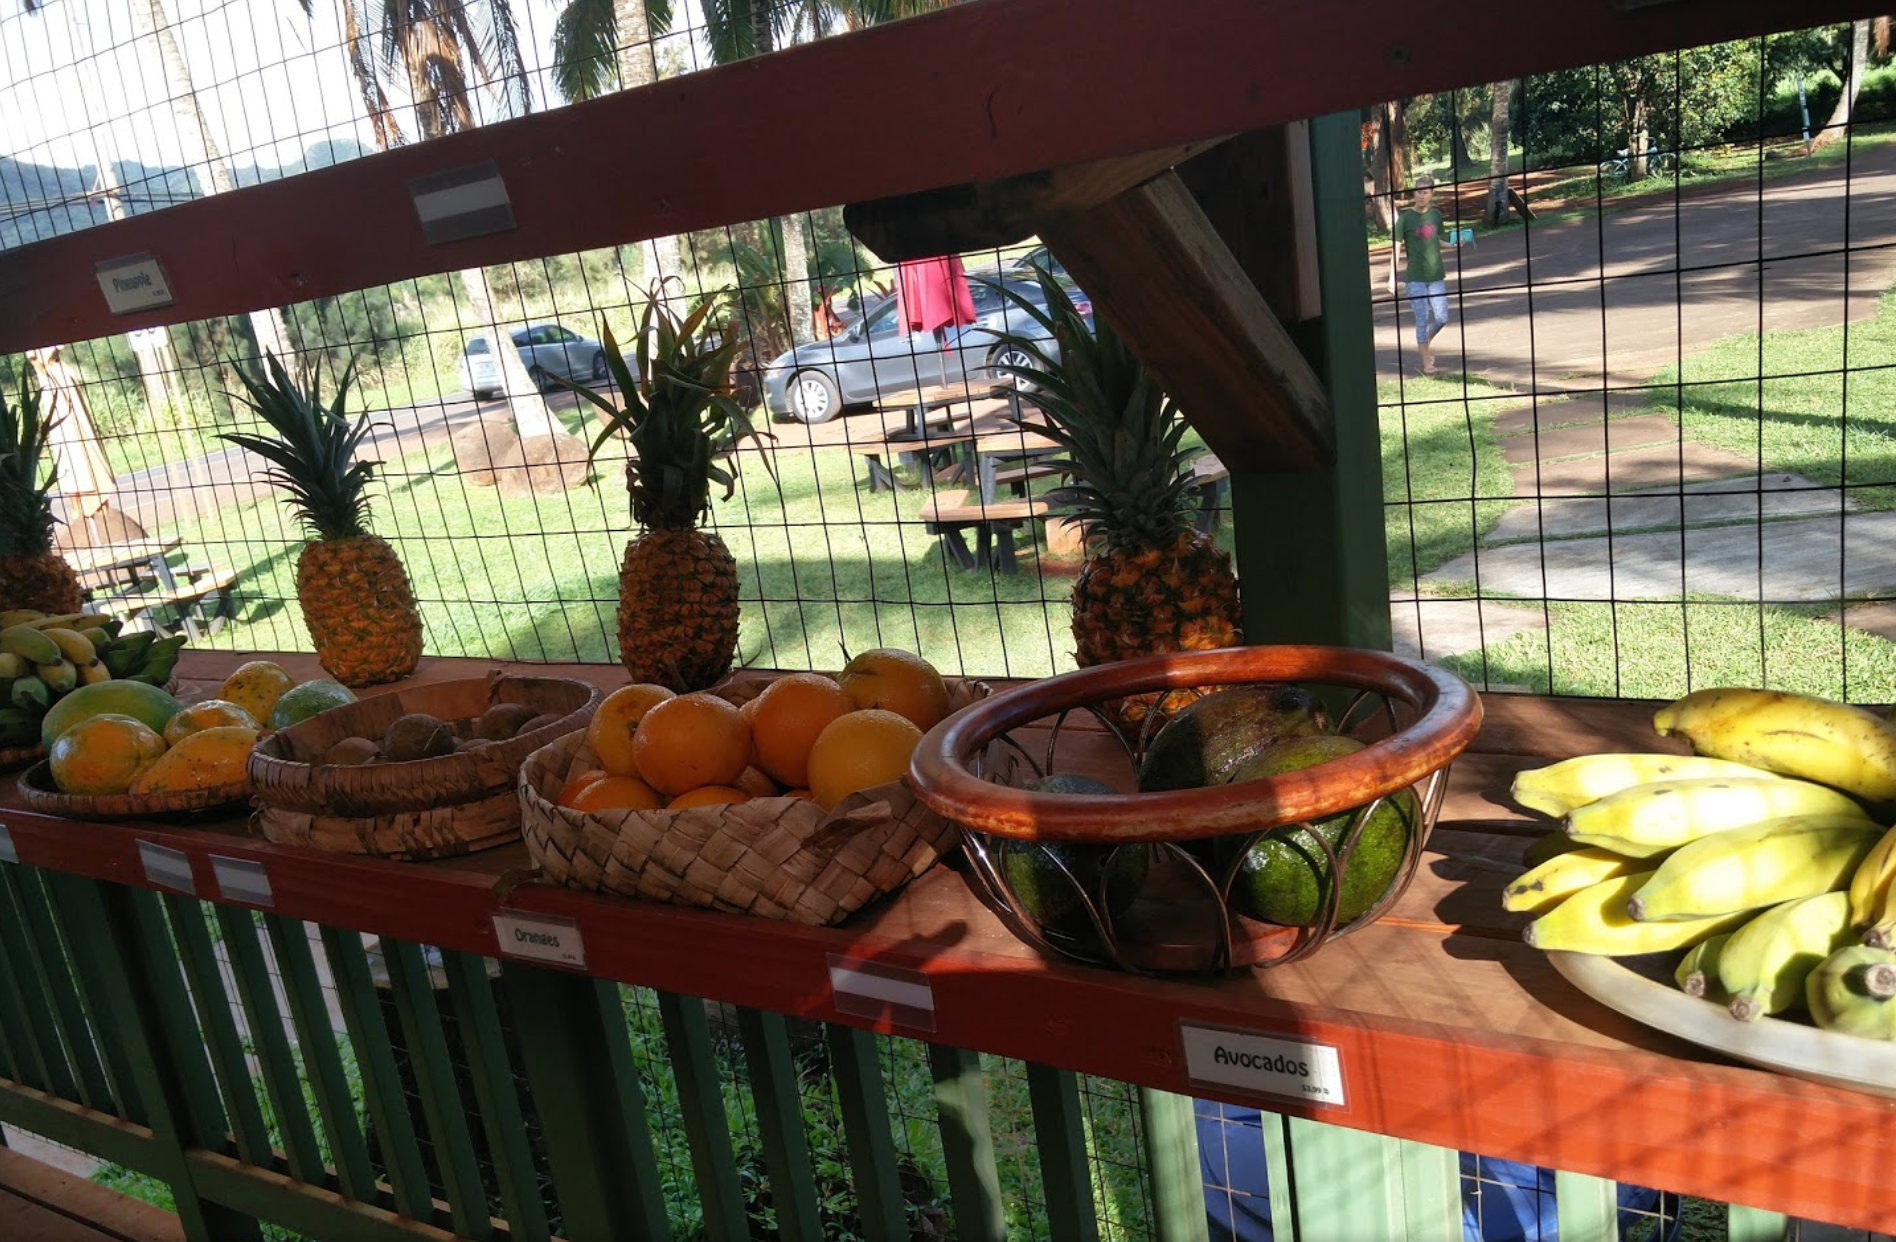 Photo 3: Moloaa Sunrise Fruit stand